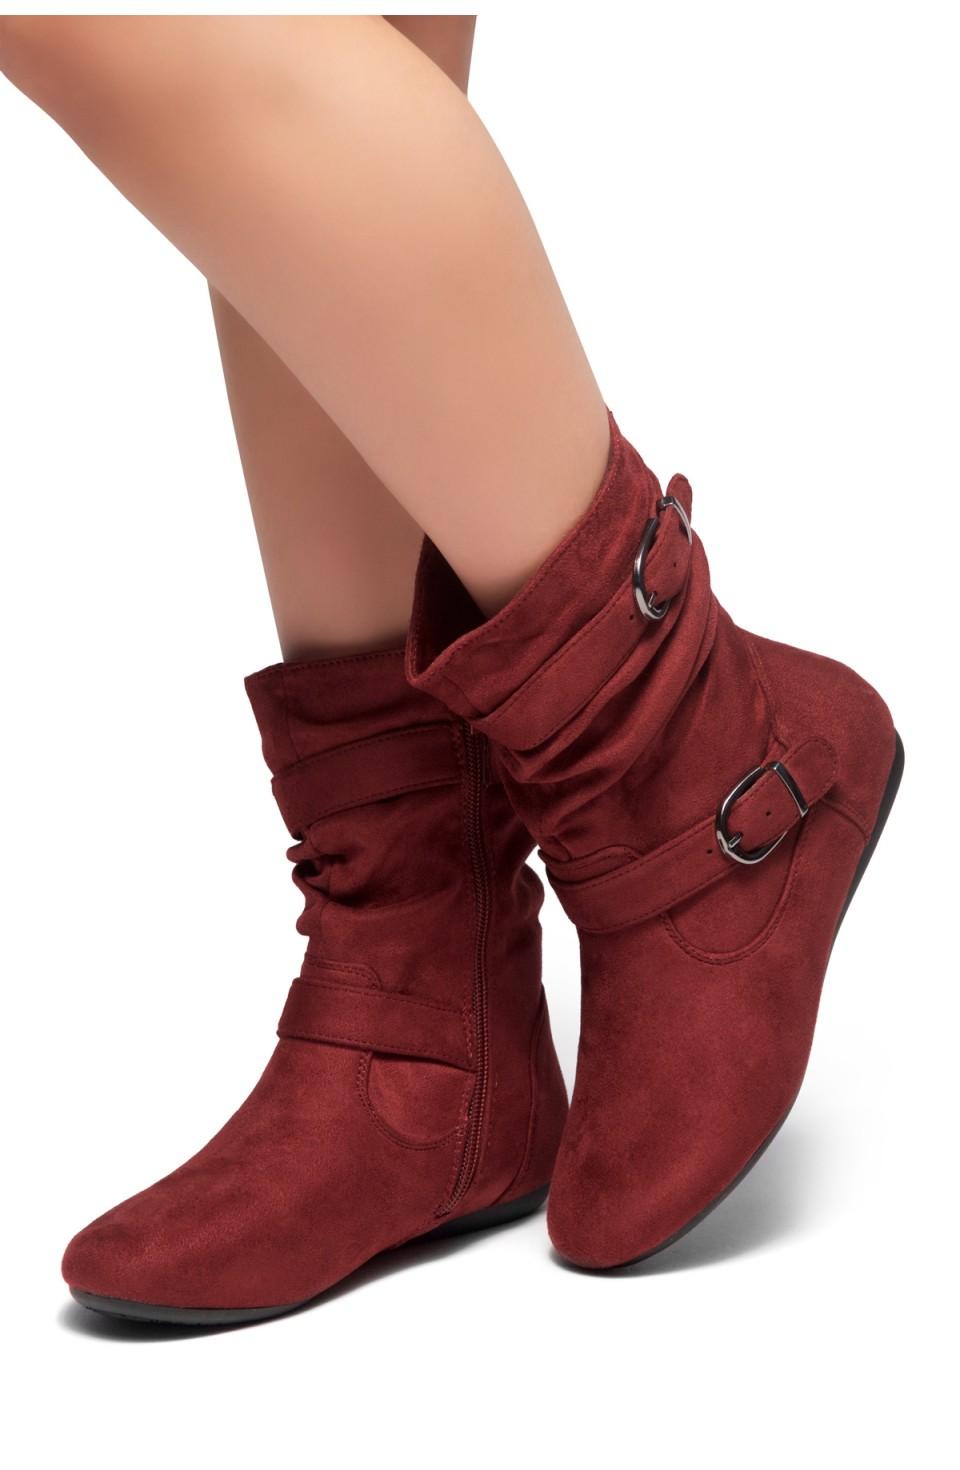 HerStyle Marvel-Round toe, stacked flat heel, buckle detail (Burgundy)